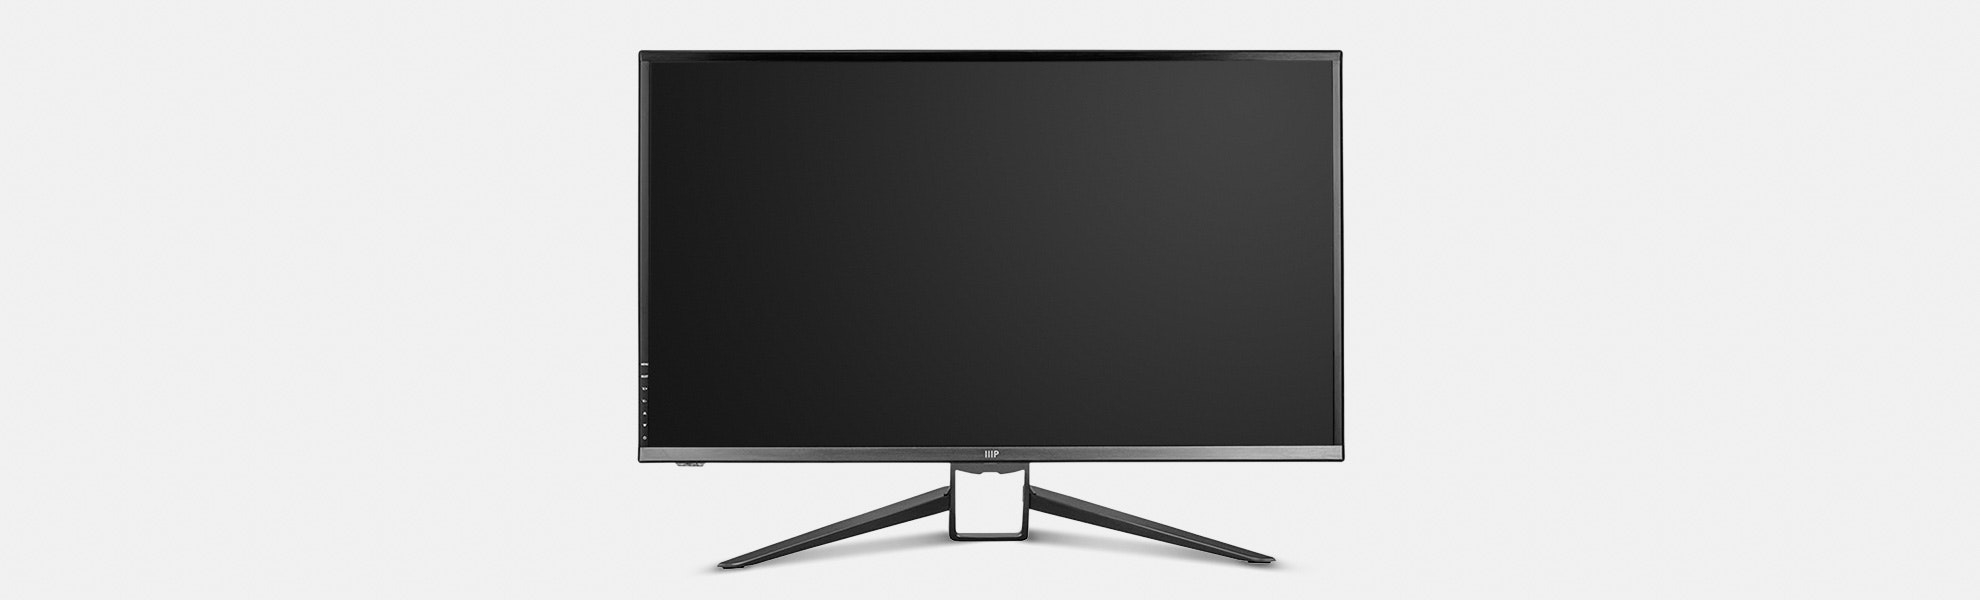 MP 27-Inch AHVA WQHD 1440p Pixel Perfect Monitor